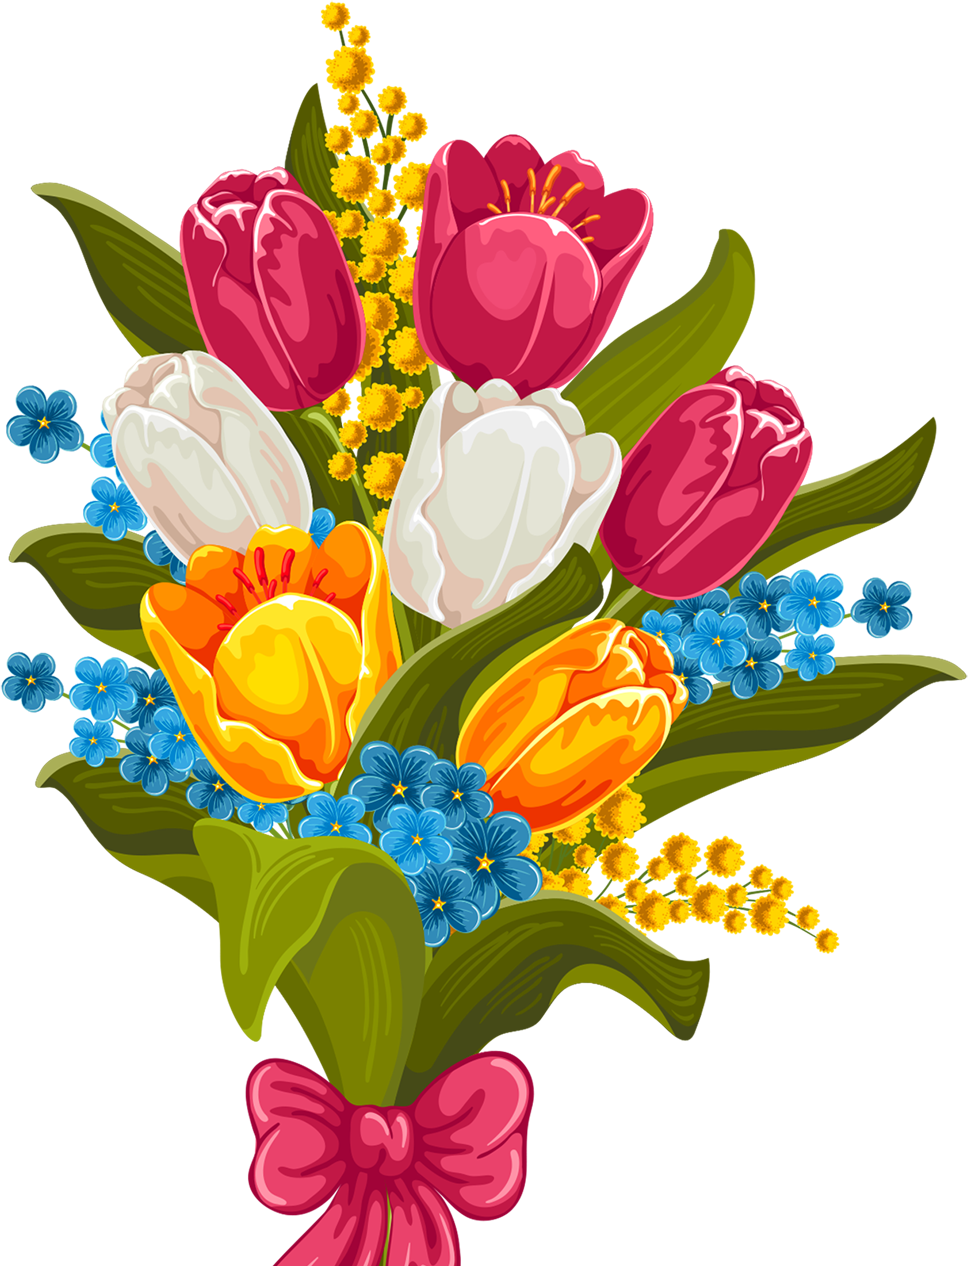 http://img-fotki.yandex.ru/get/4116/41771327.35b/0_8869e_e893460f_orig.png